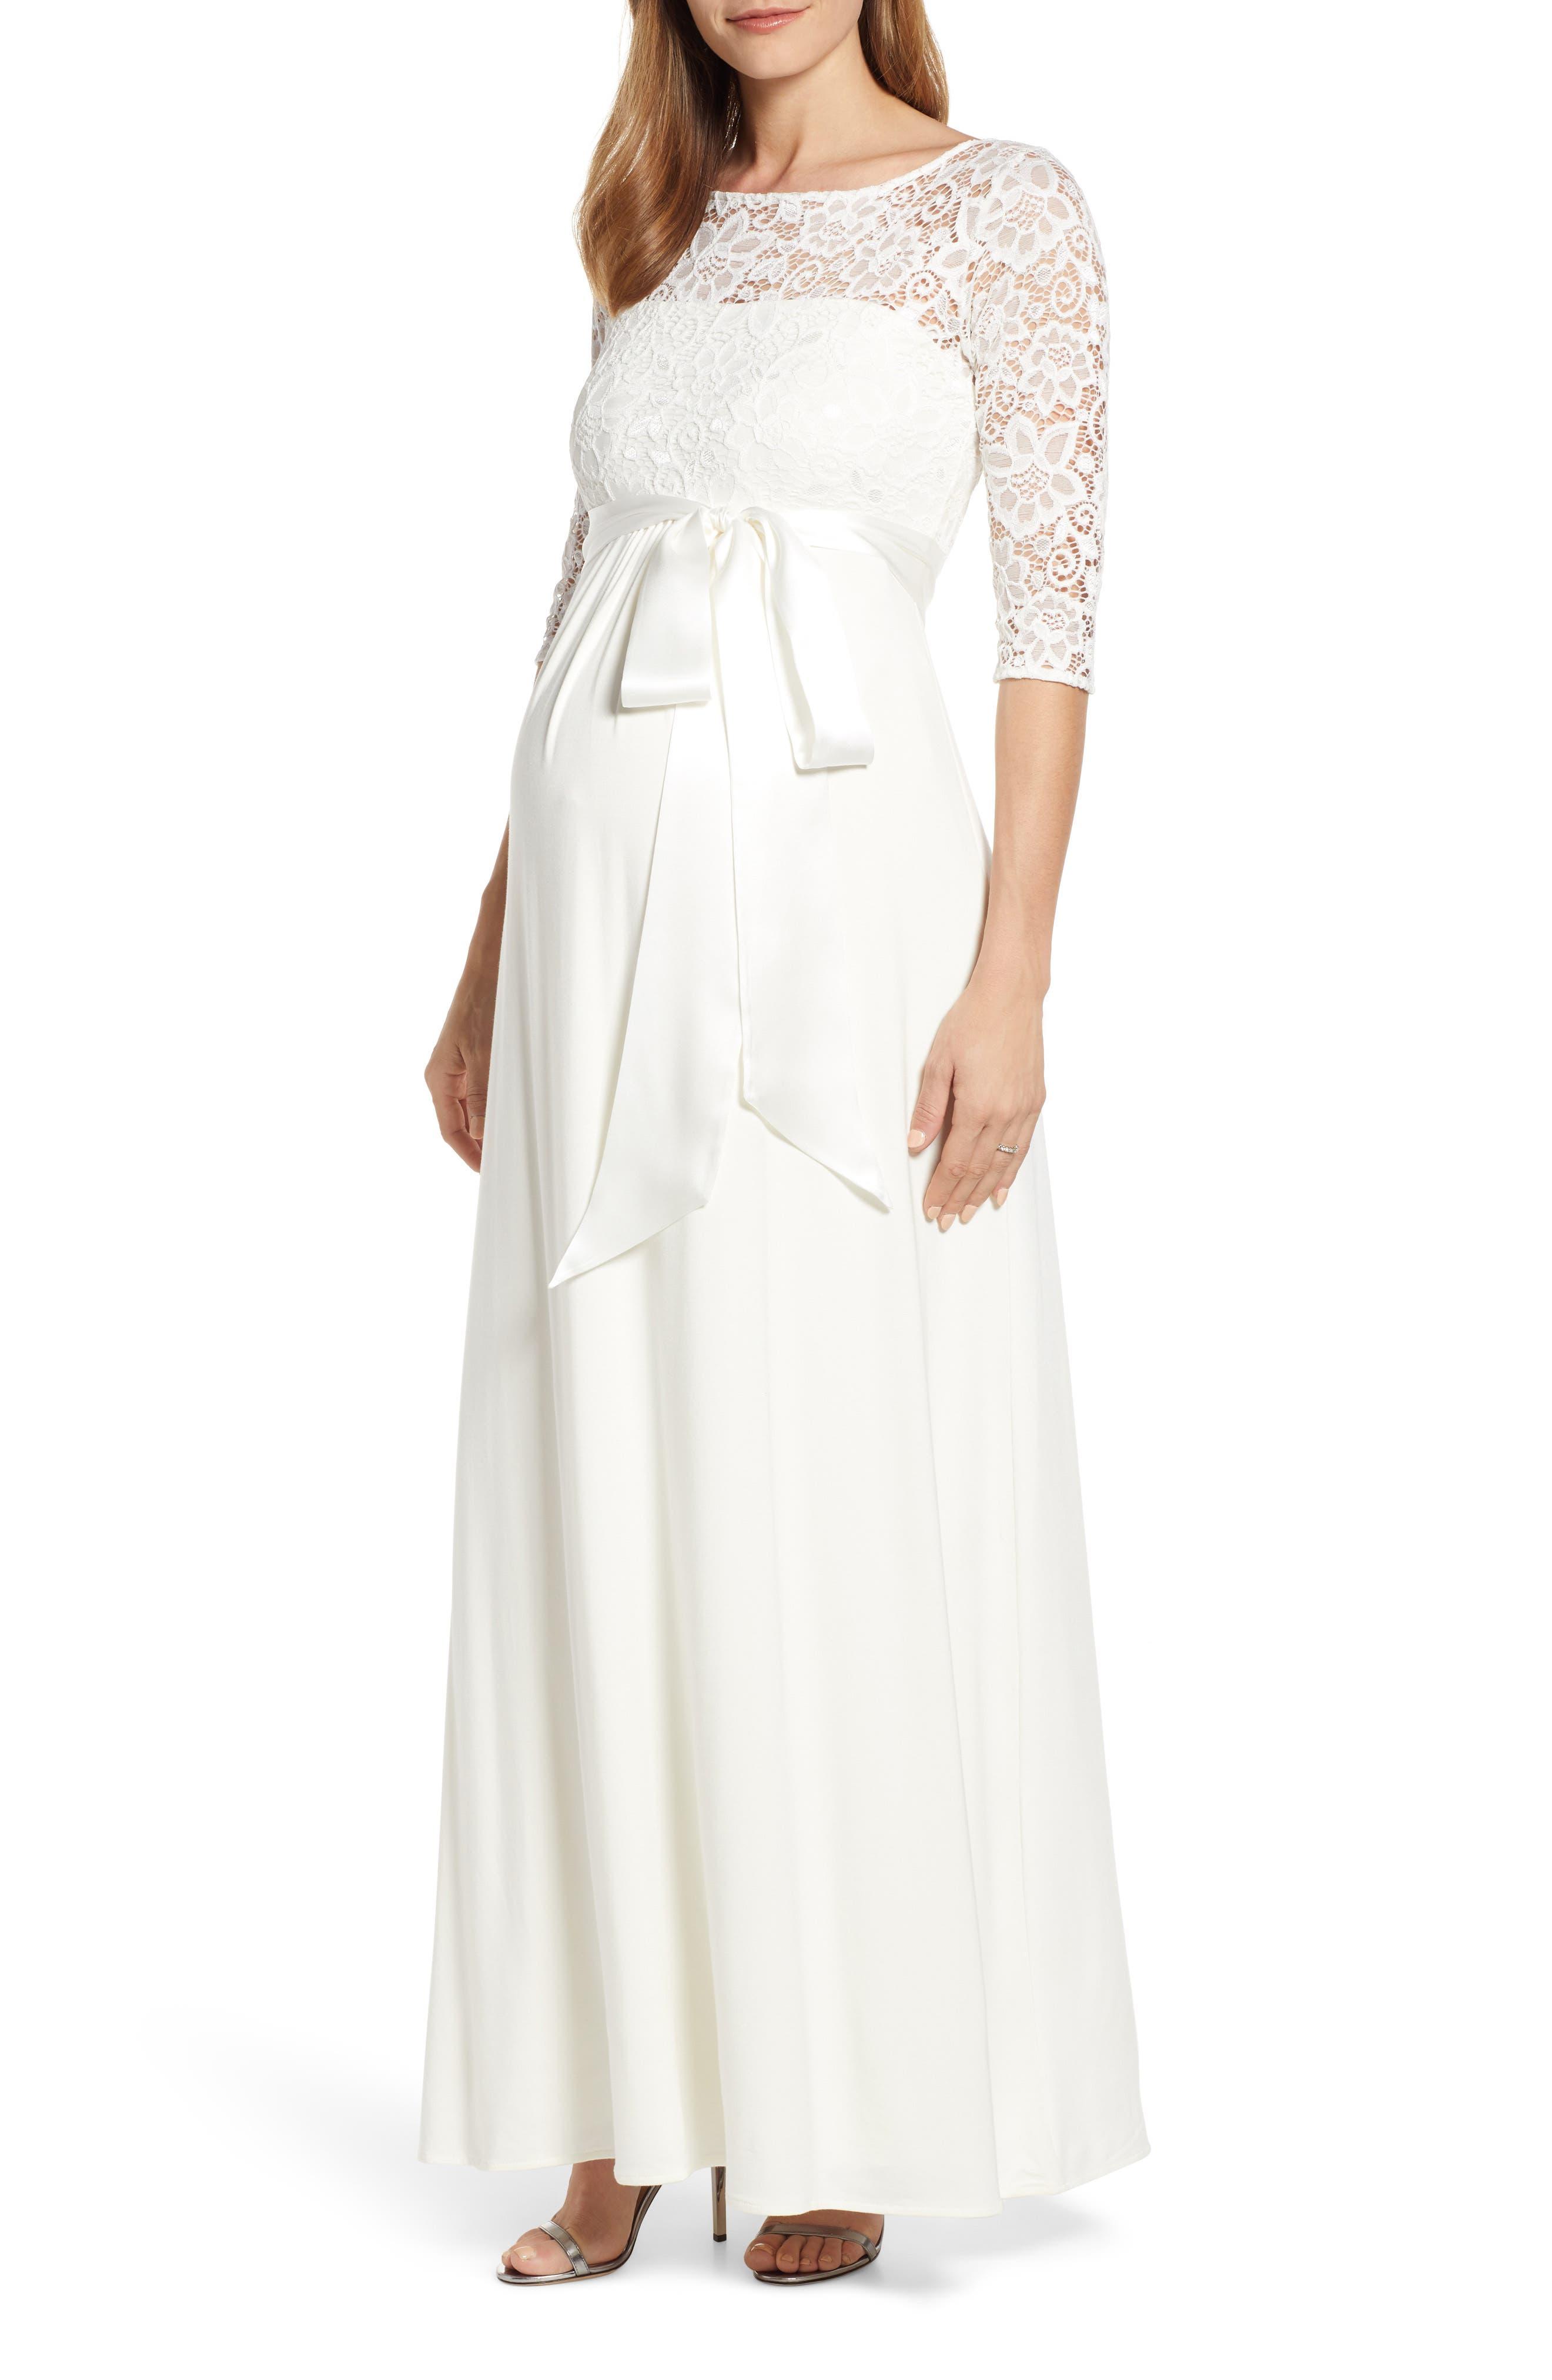 Tiffany Rose Maternity Wedding Dresses